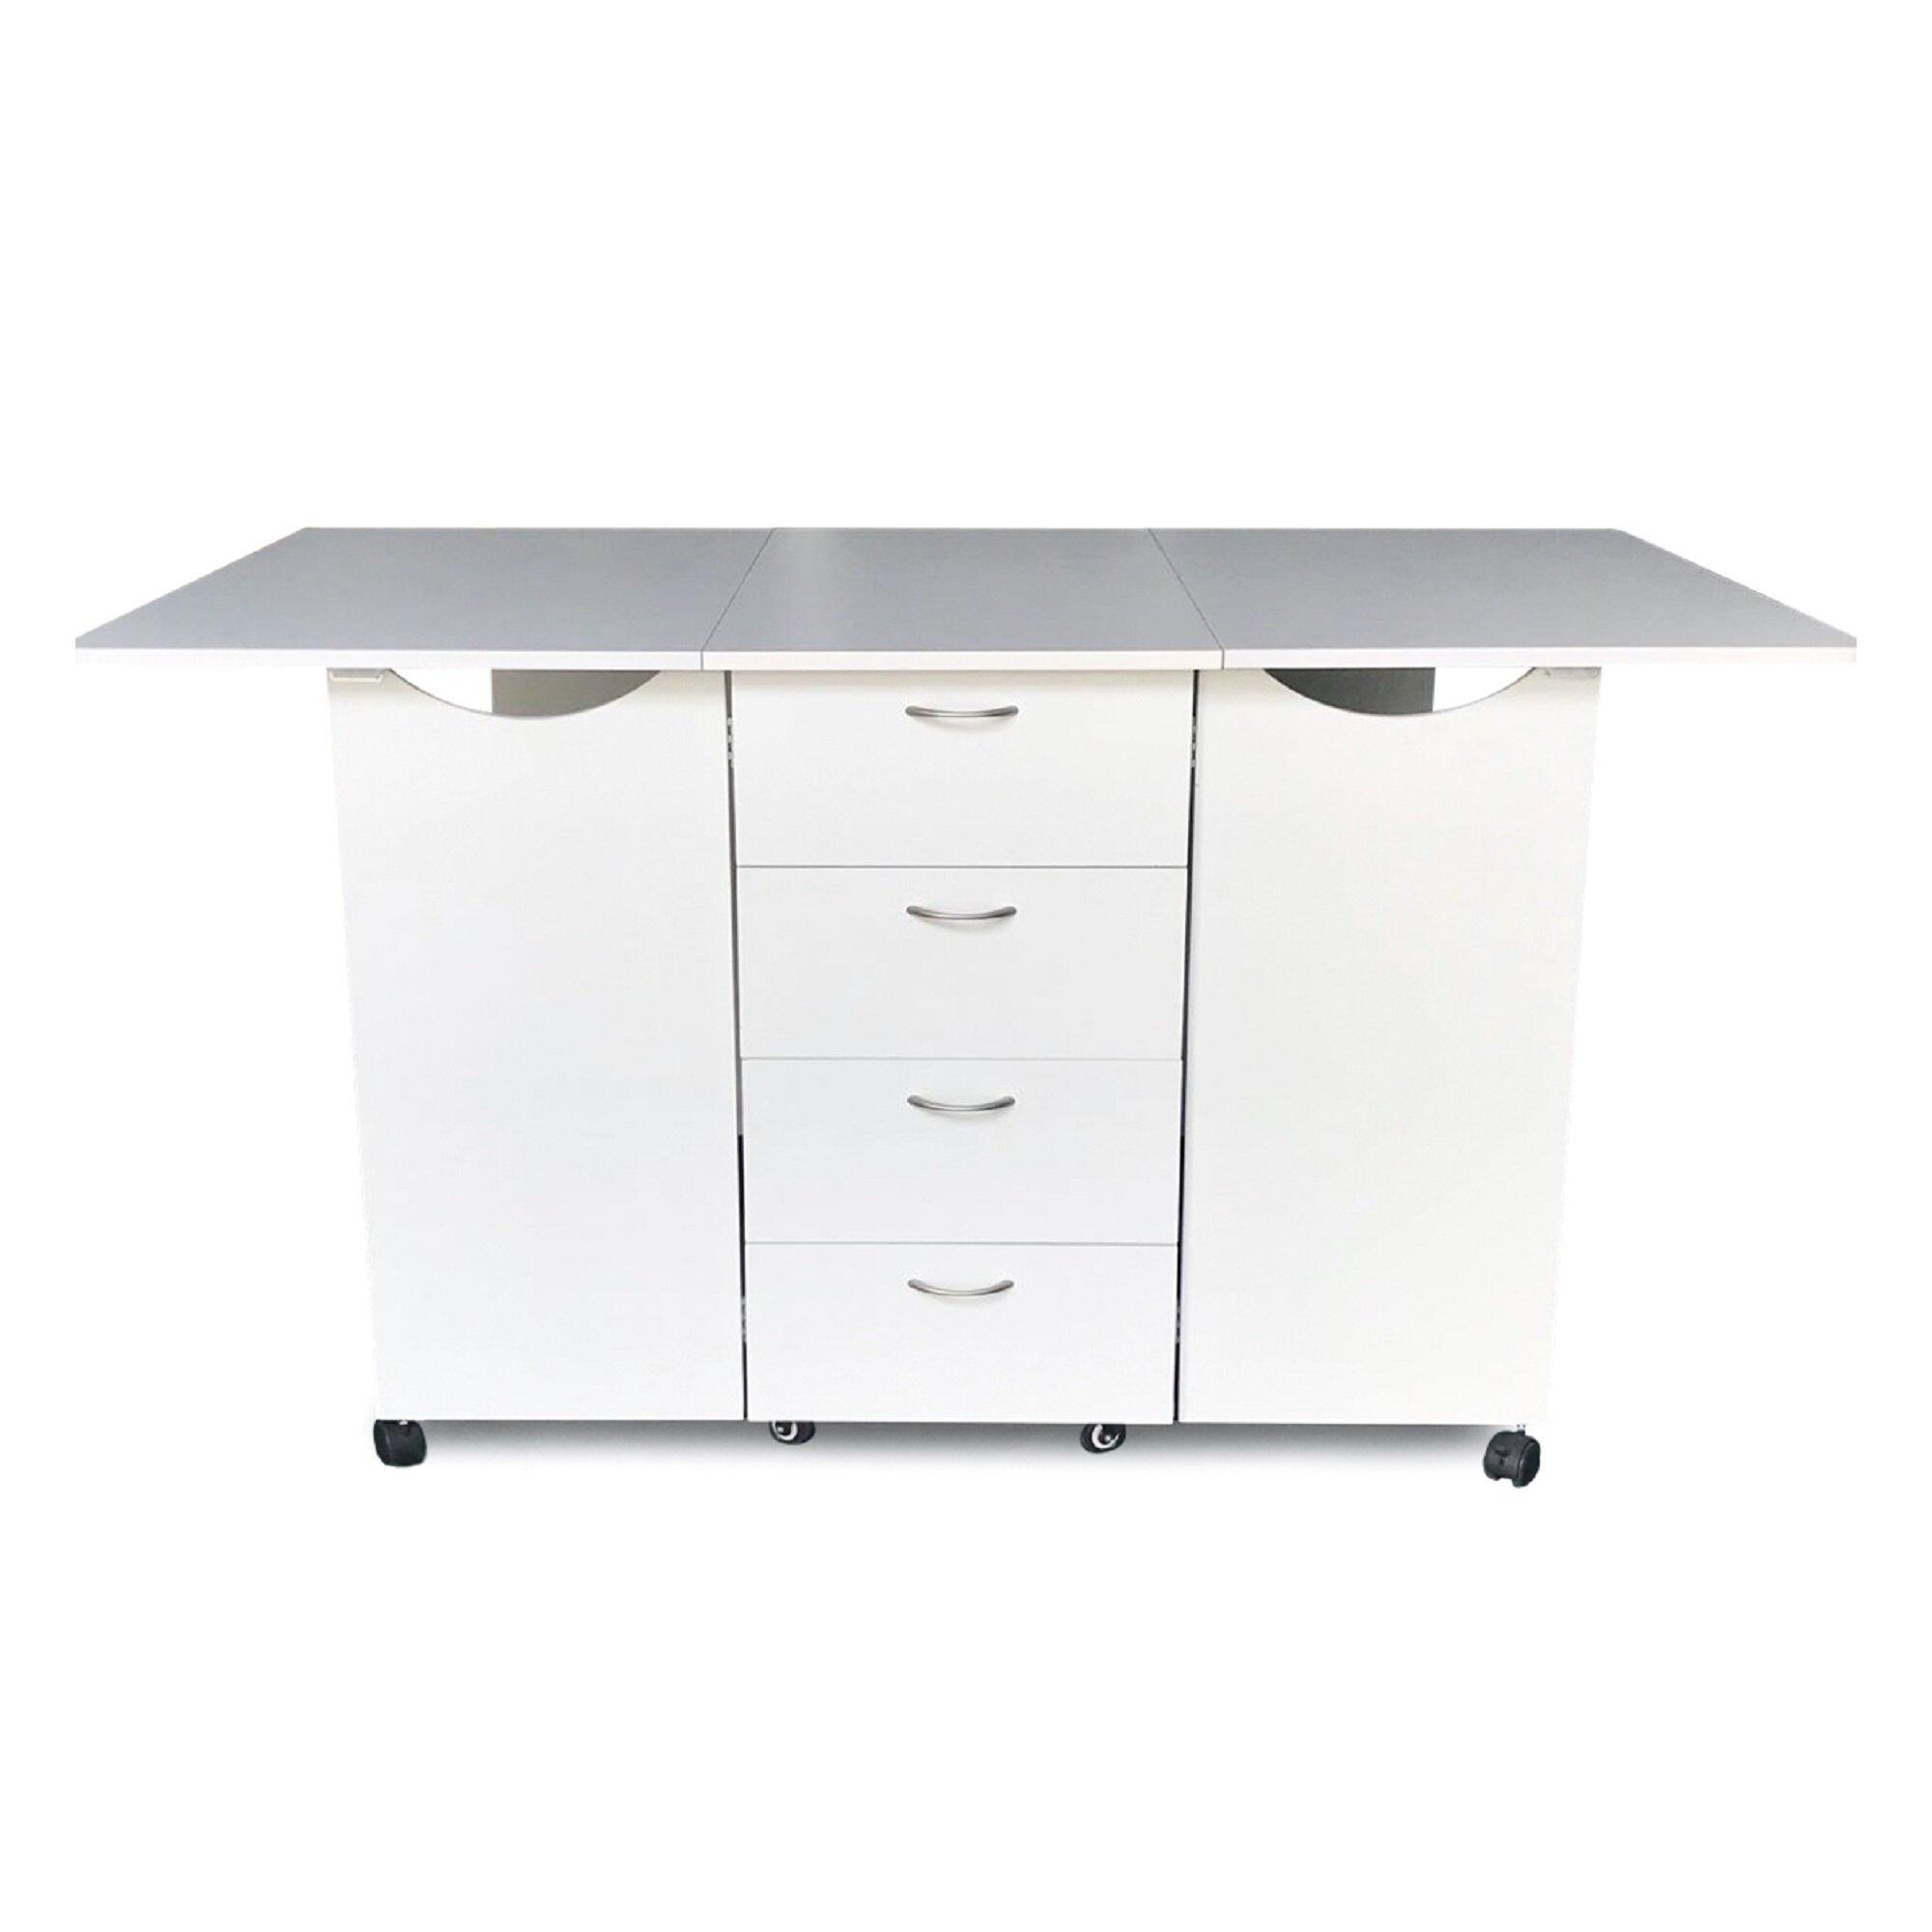 Kangaroo Cabinets 70 X 40 Foldable Crafting Storage Cabinet Wayfair